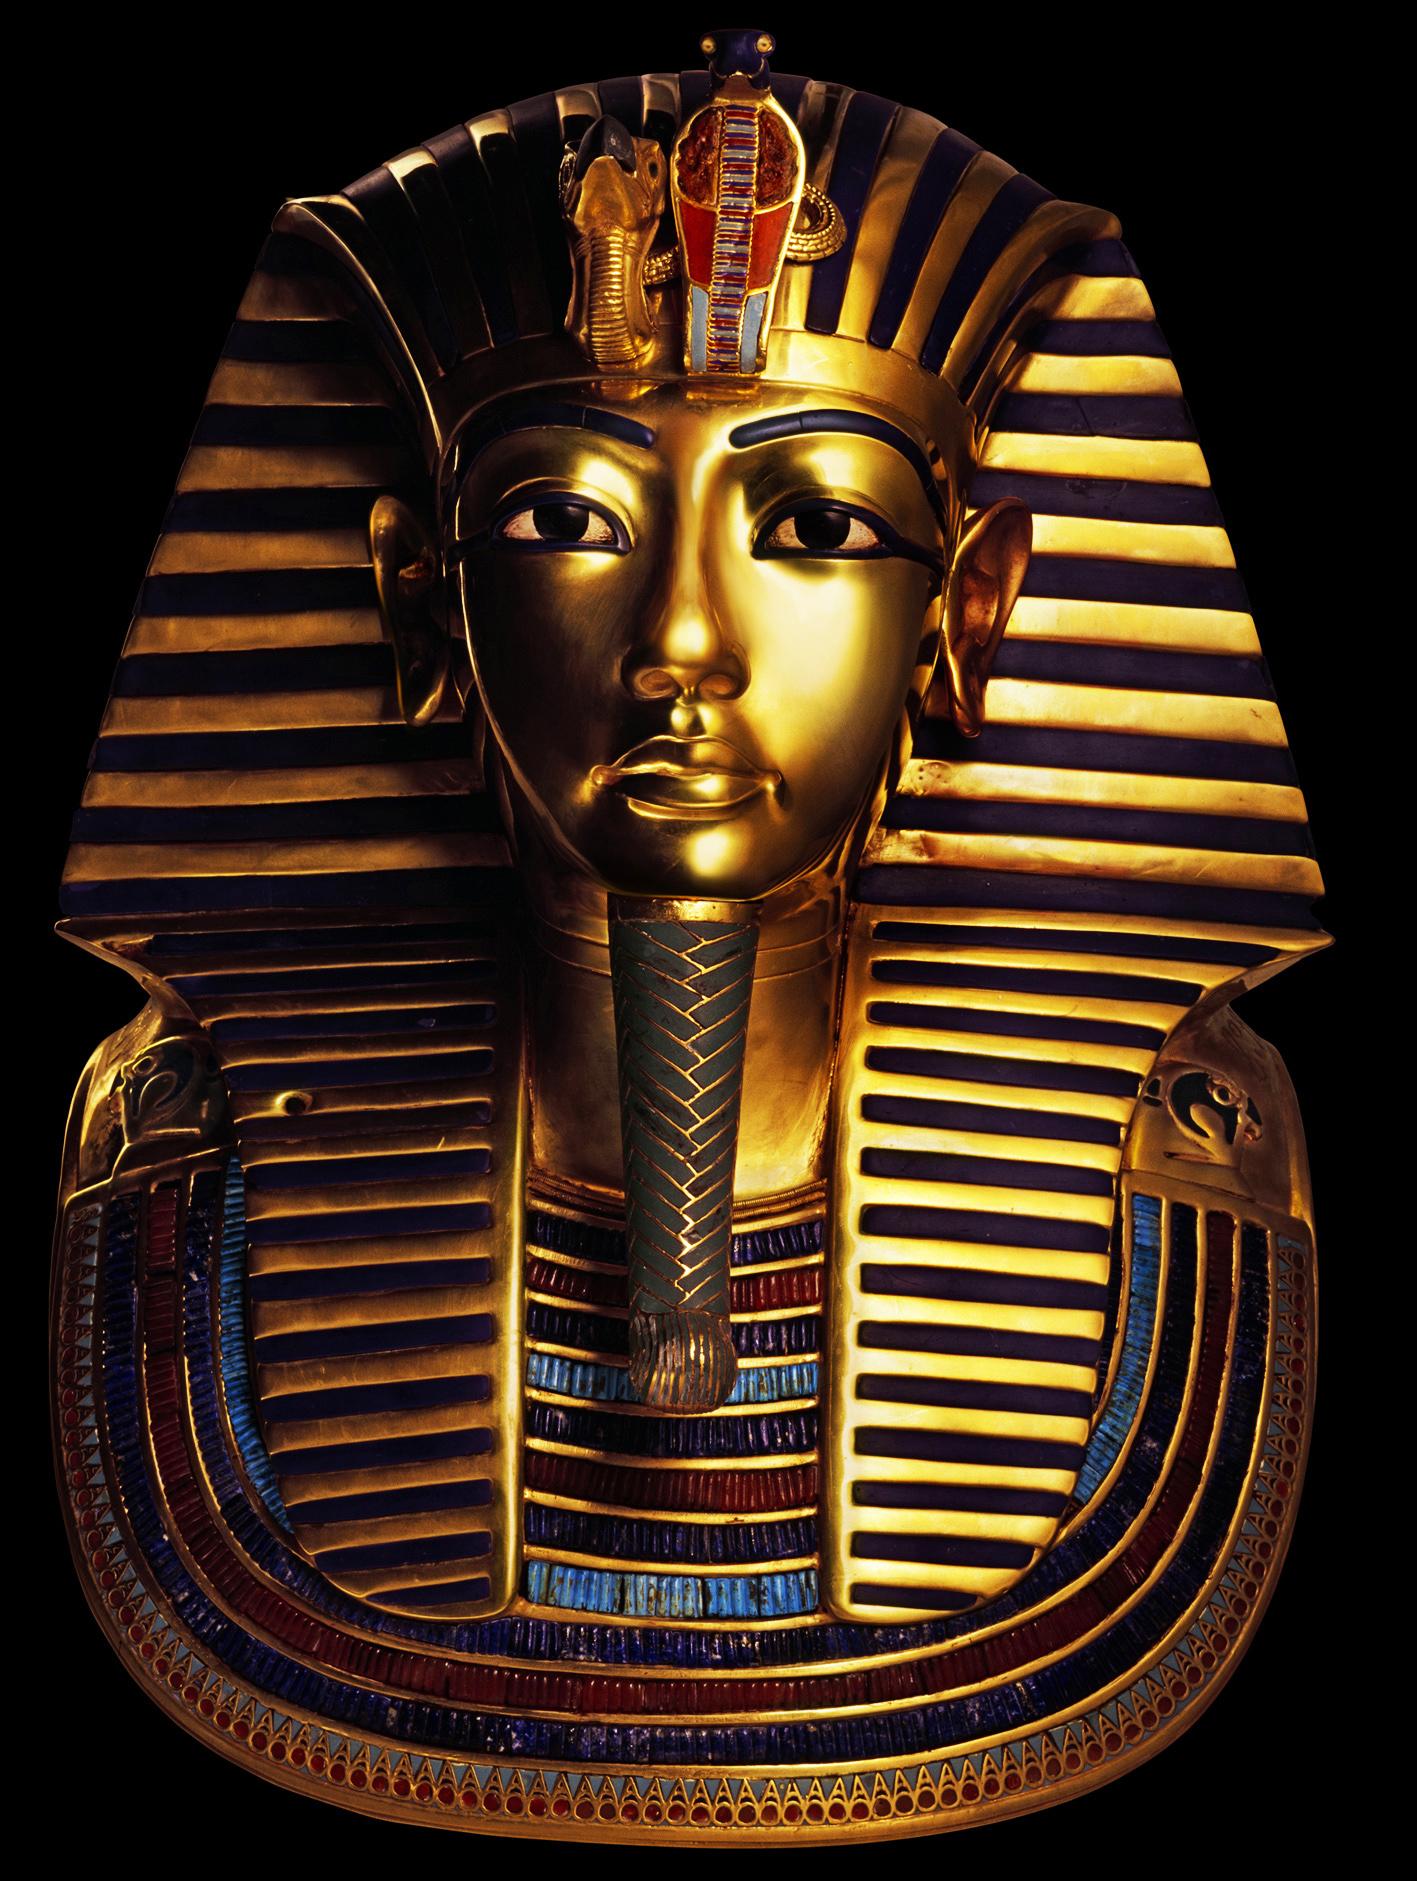 1- Golden Mask of Tutankhamun (Photographed by A.M. v. Sarosdy) Photo credit- SC Exhibitions